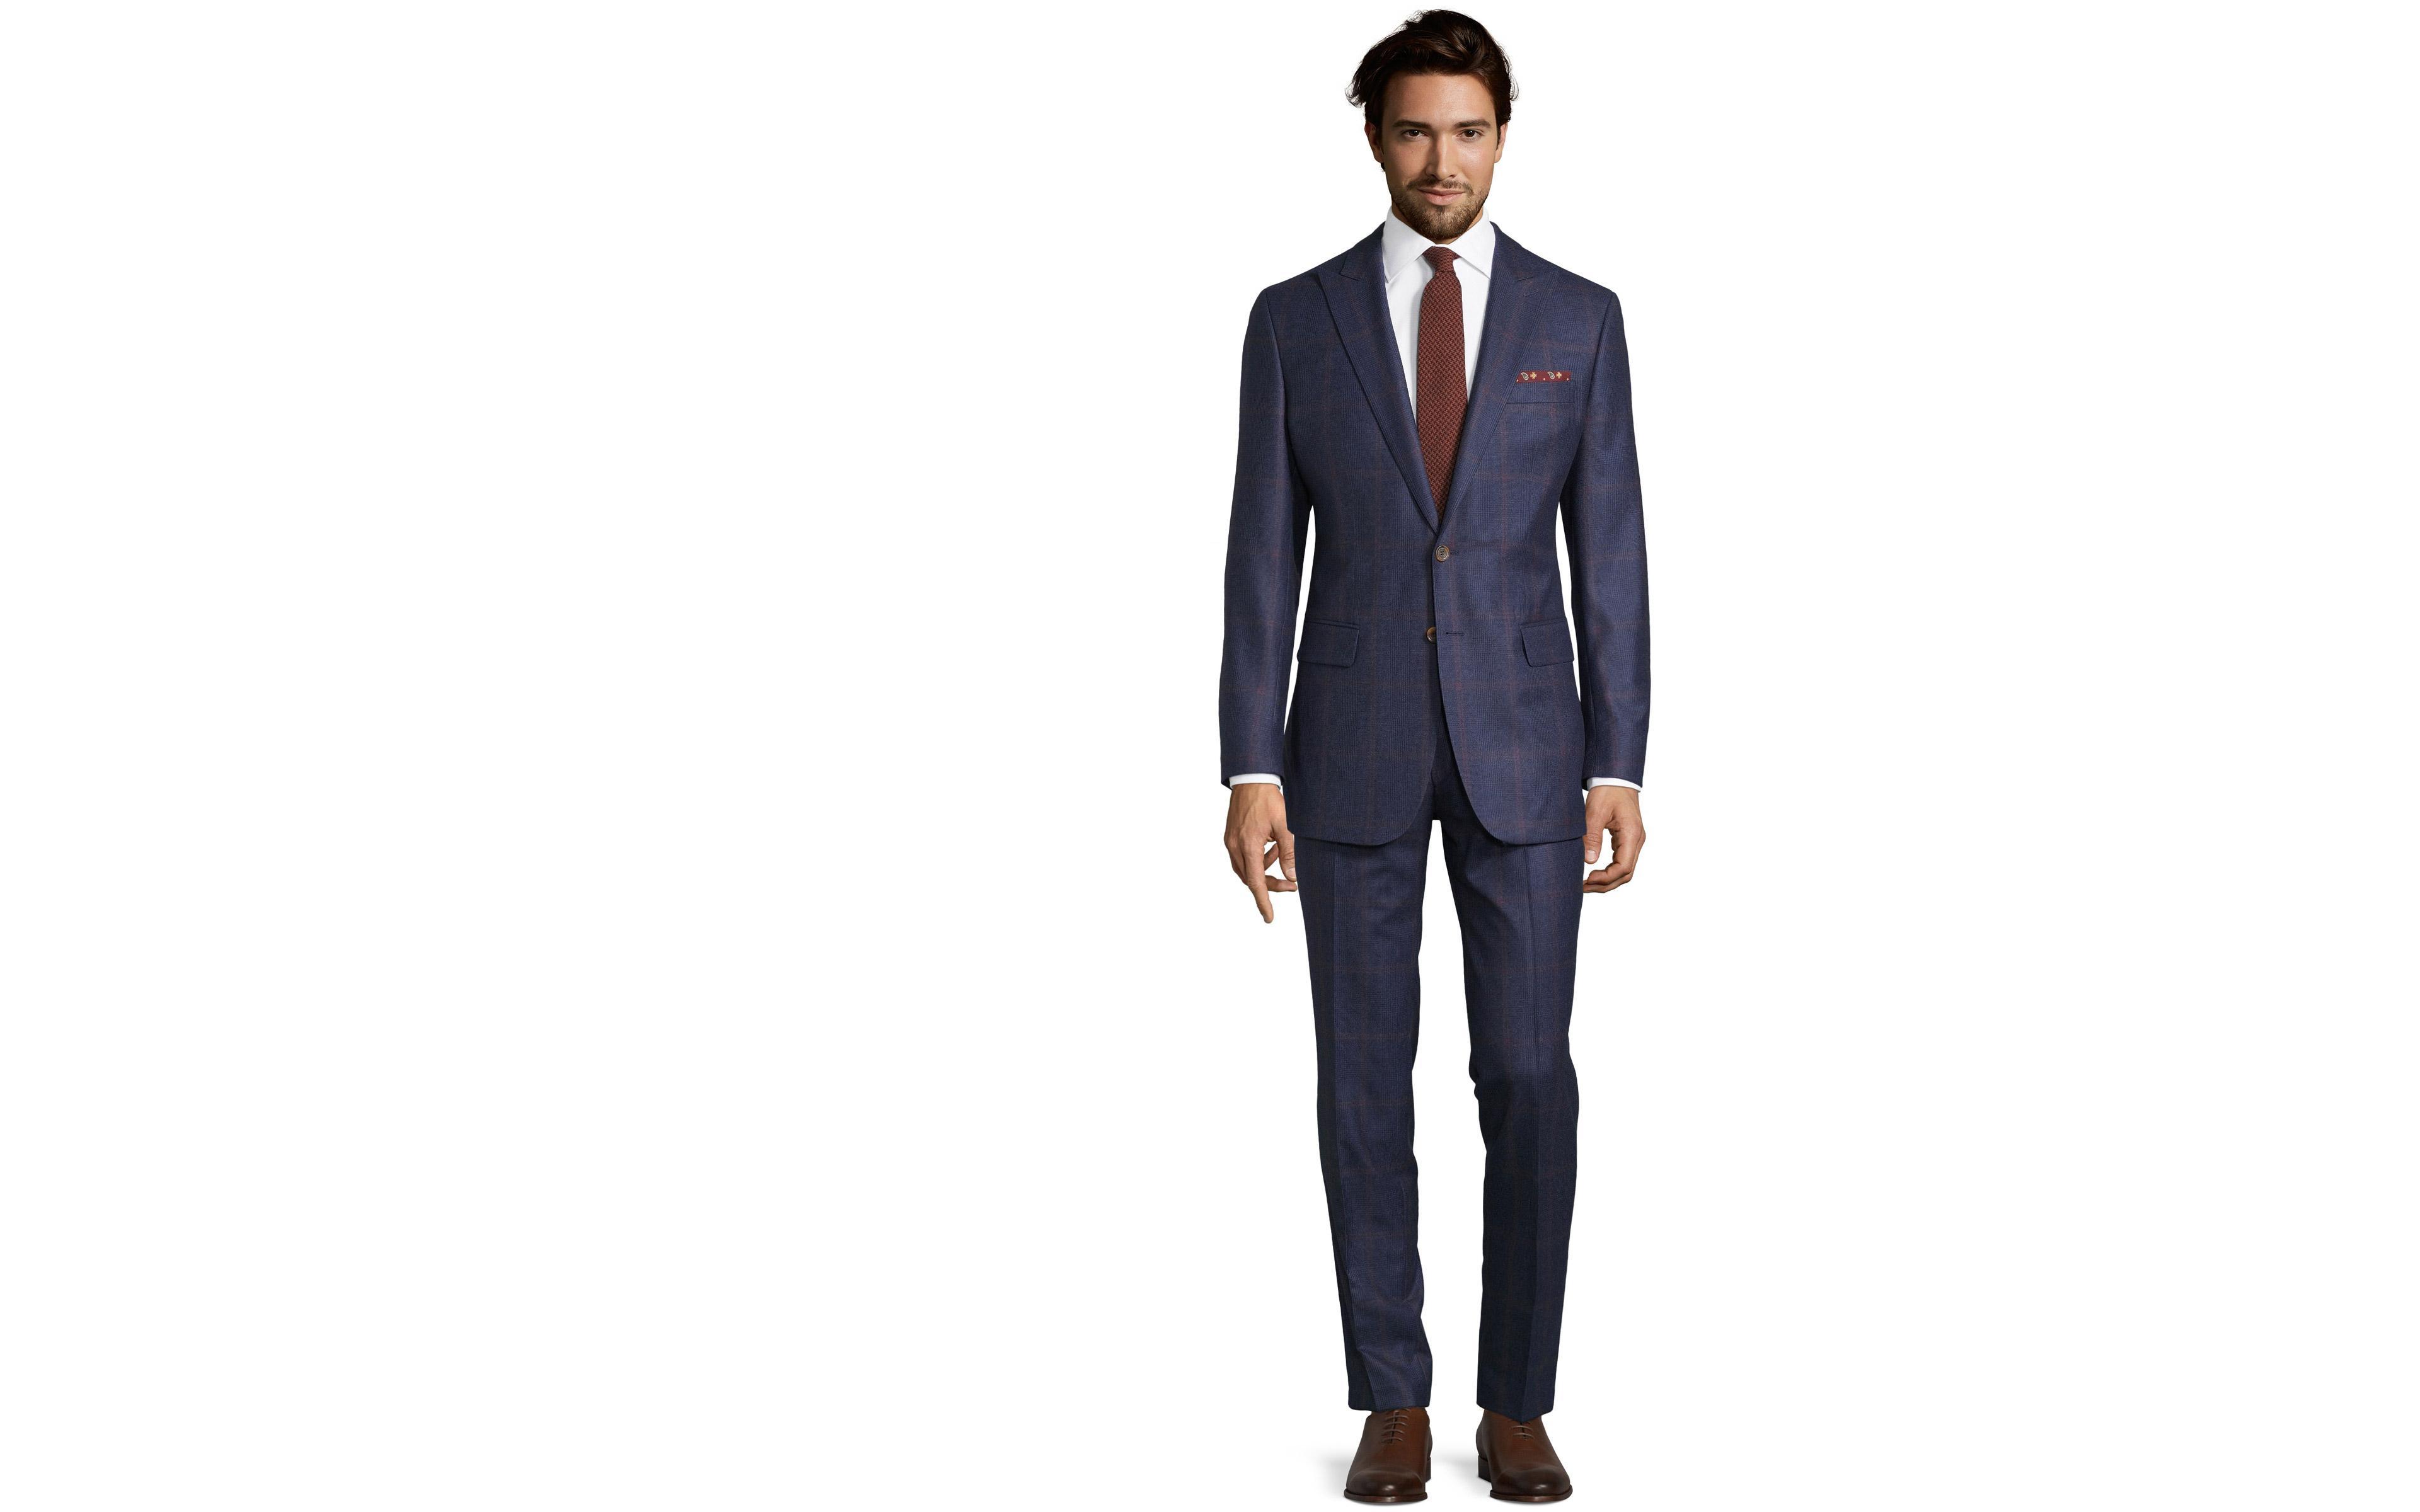 Tangerine Check Navy Plaid Suit